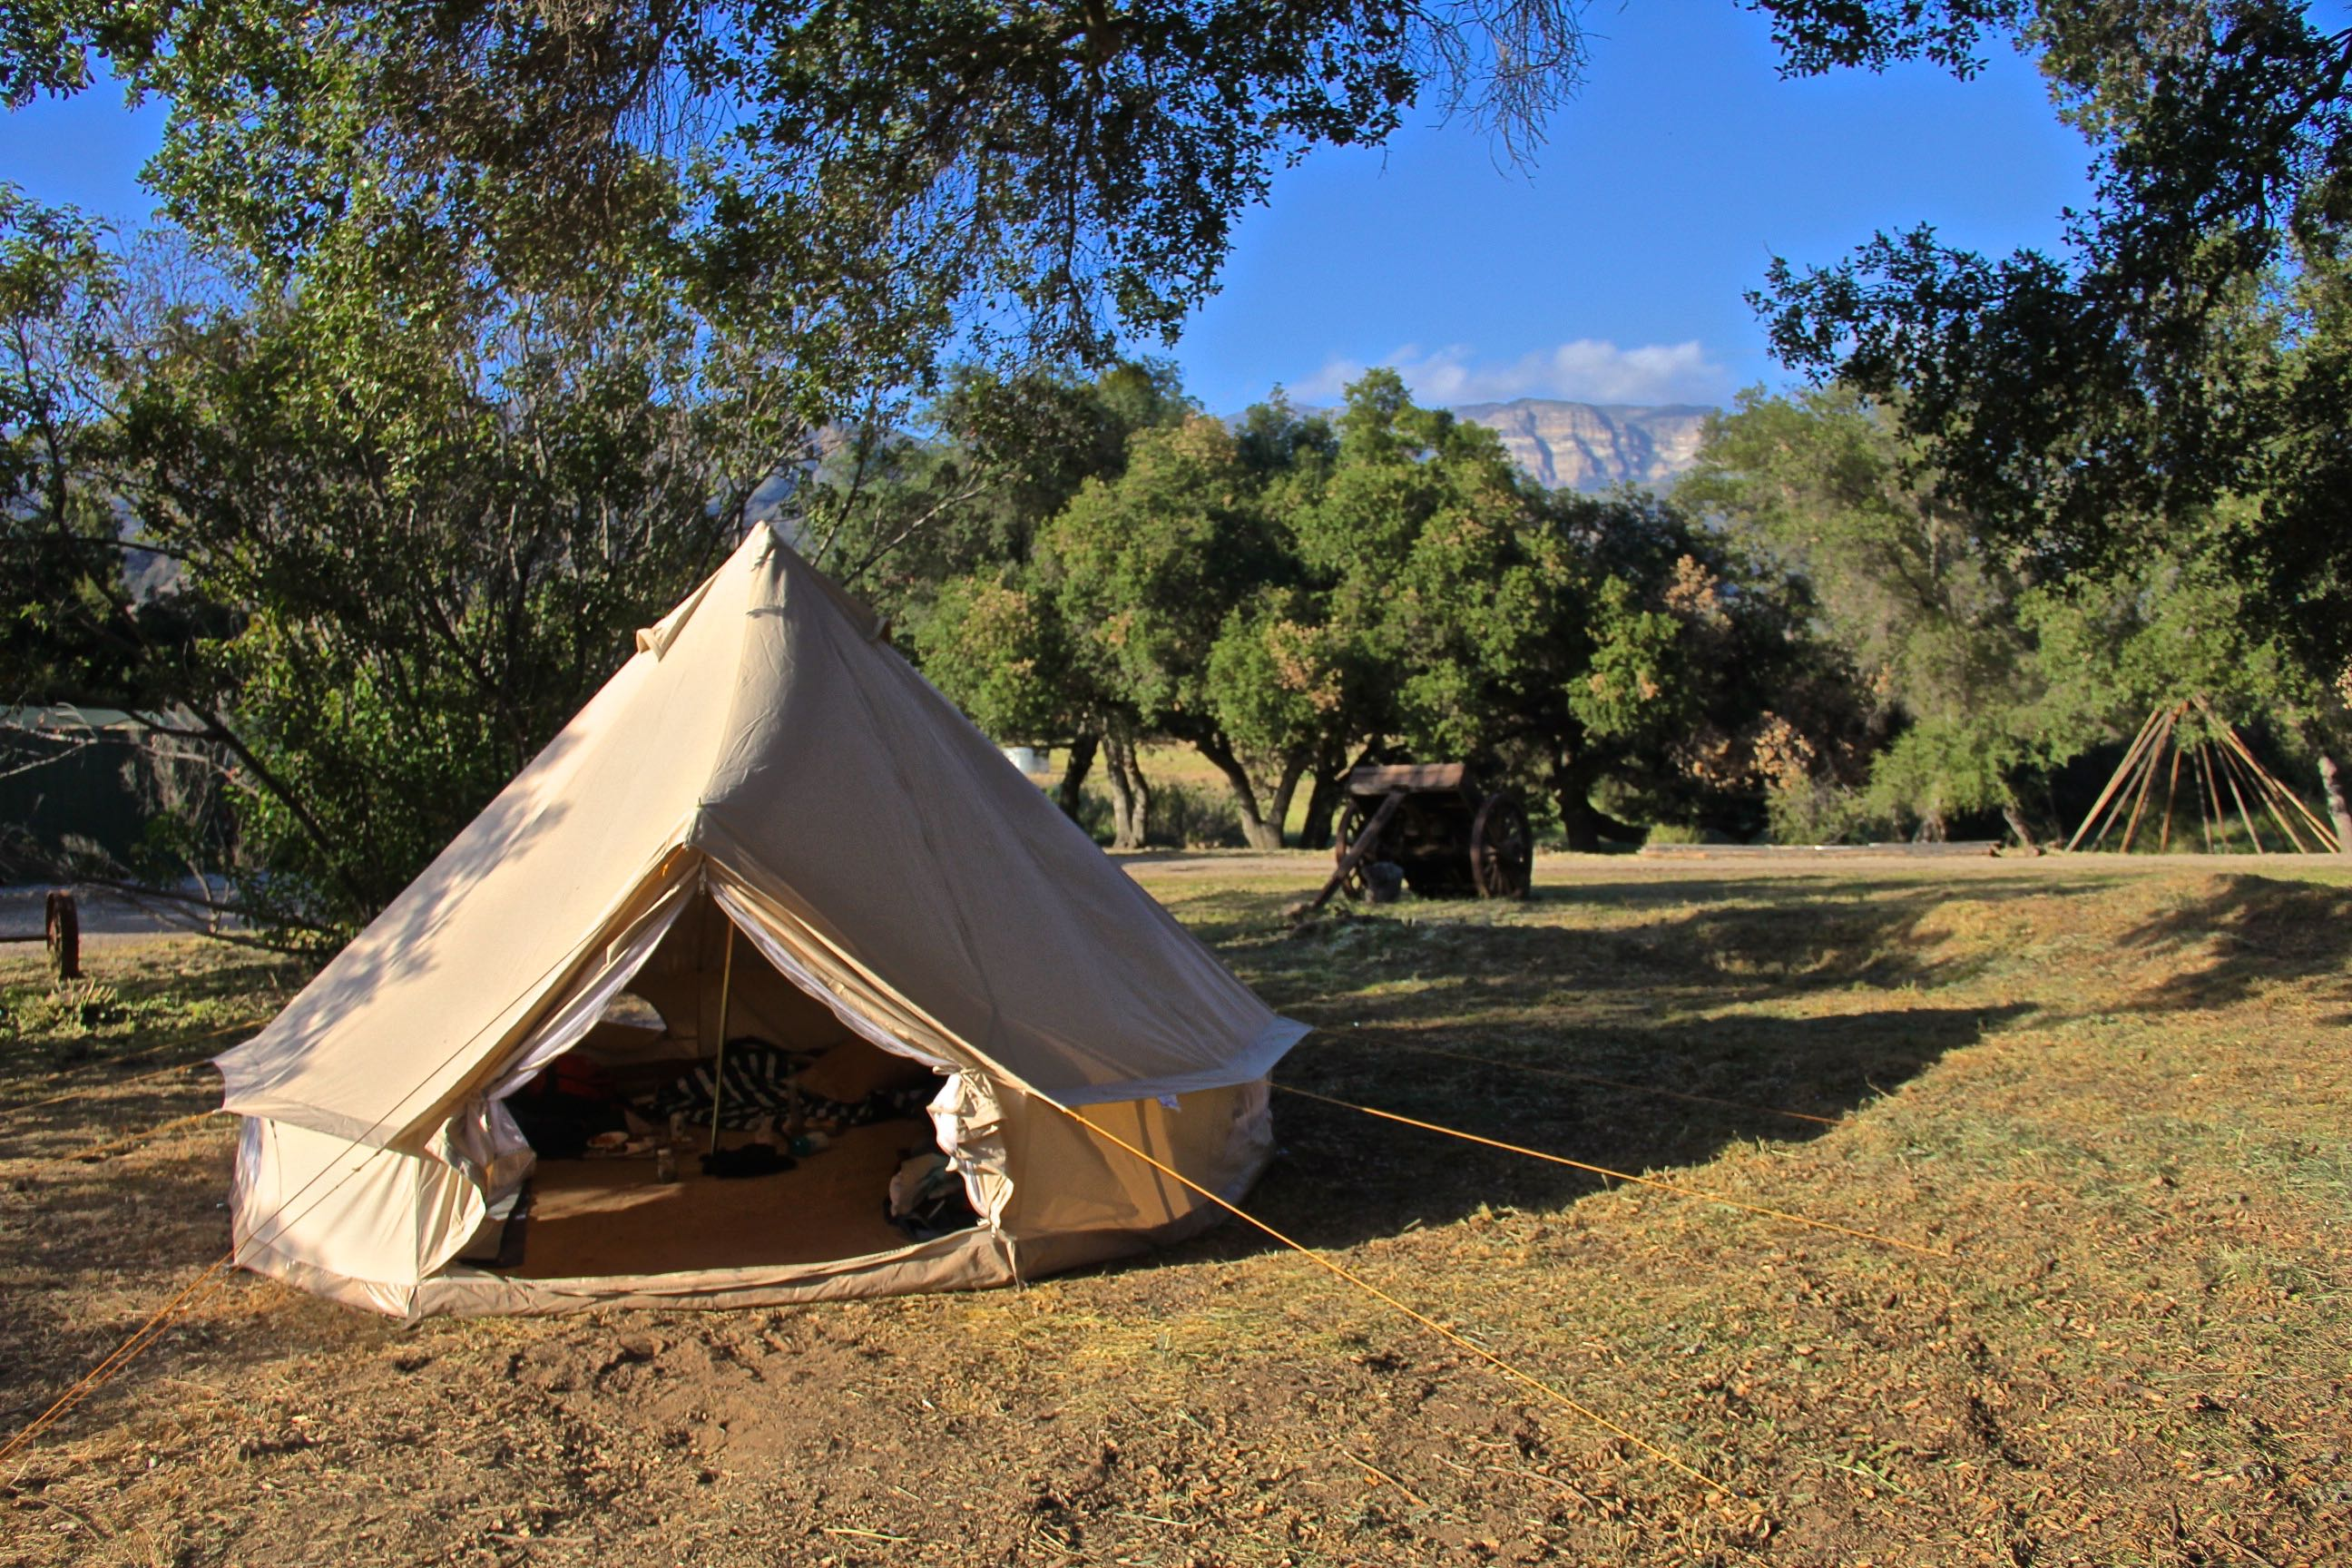 my tent & CoWBOyS u0026 iNdiANs 2015 viBrAtiON tEcH iN eFFeCt u2013 SWEENEY